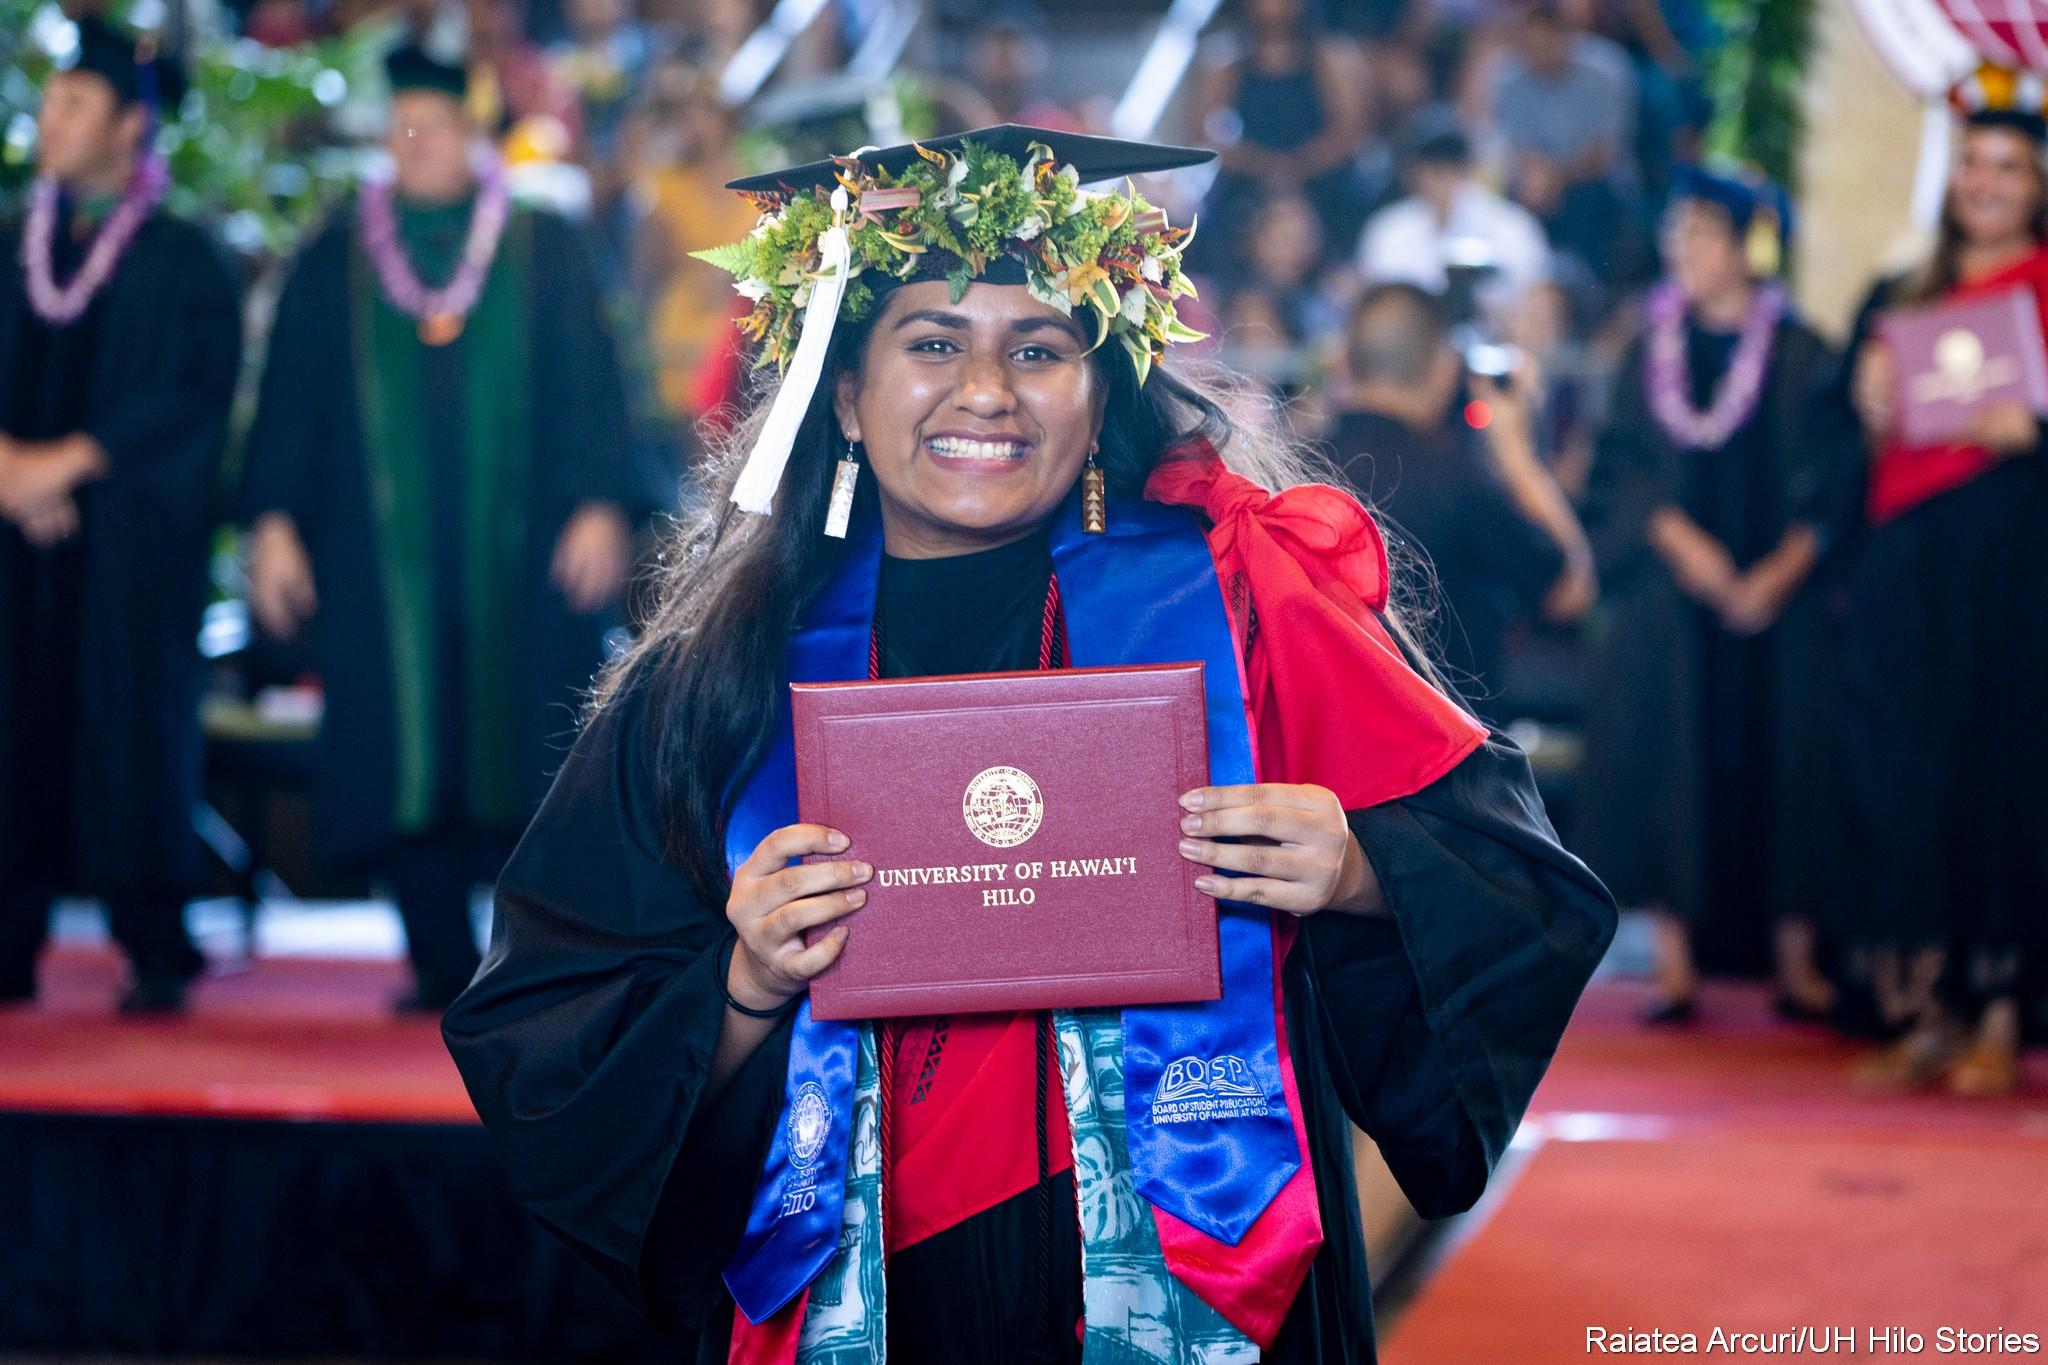 Graduate leaving dais with diploma.